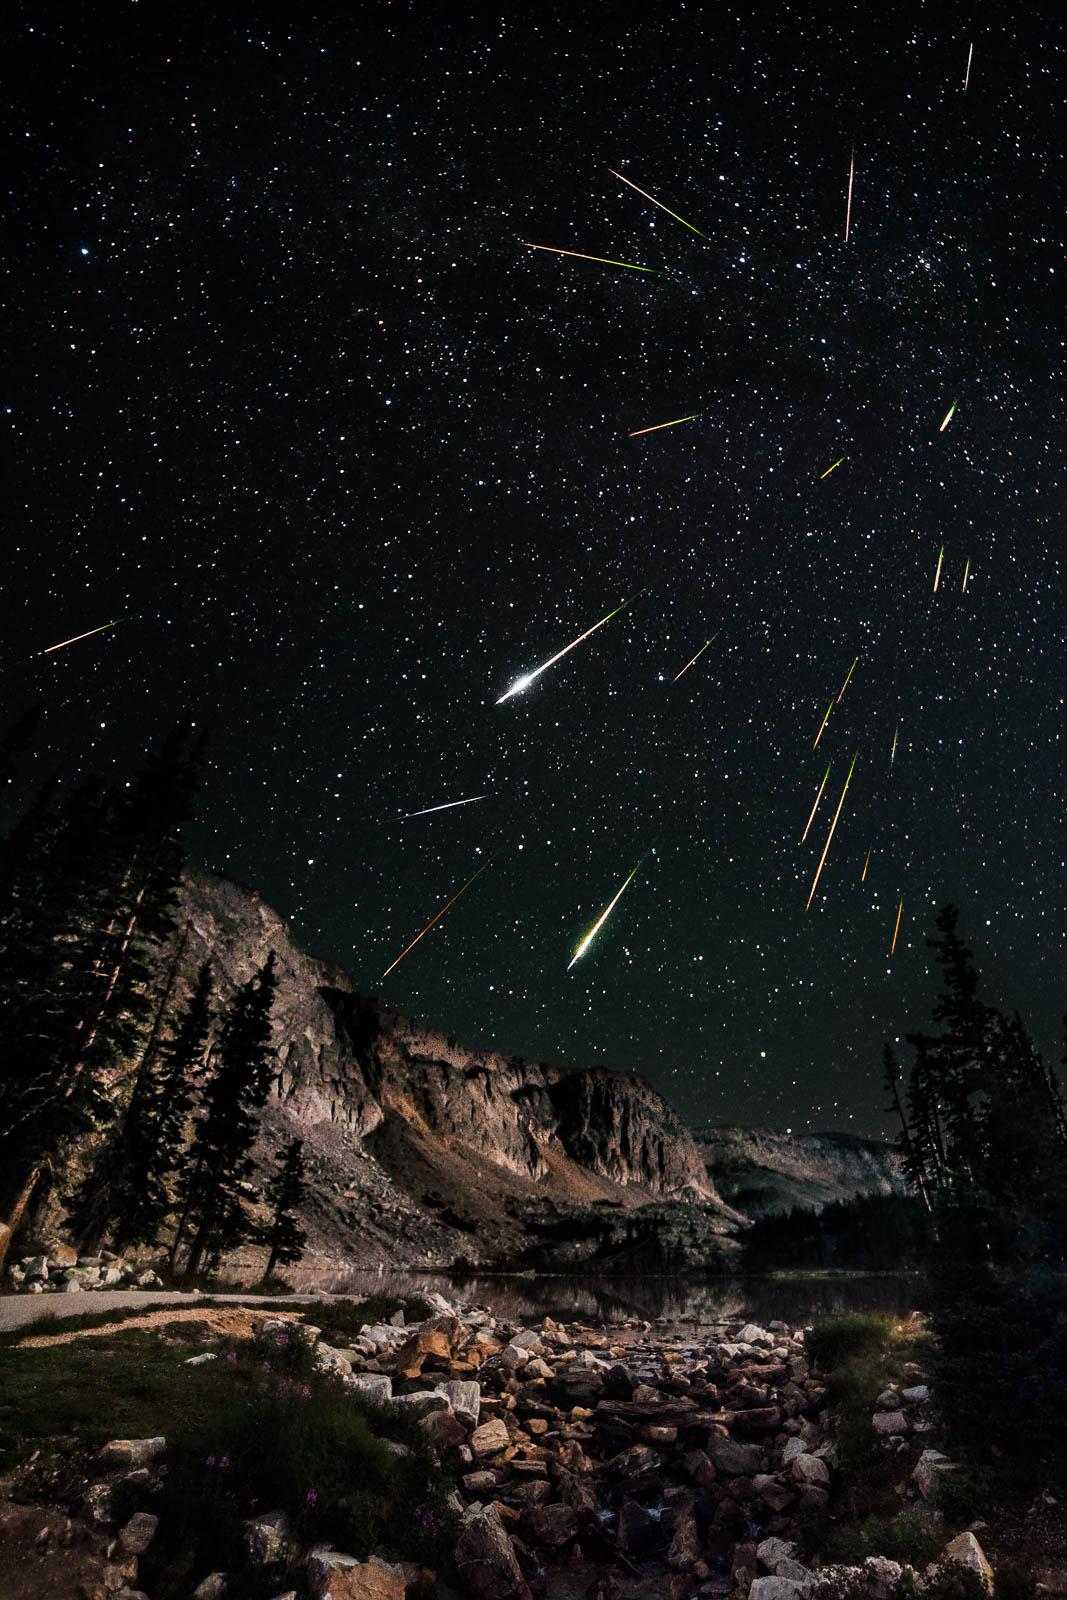 Perseids Meteor Shower over Snowy Range in Wyoming